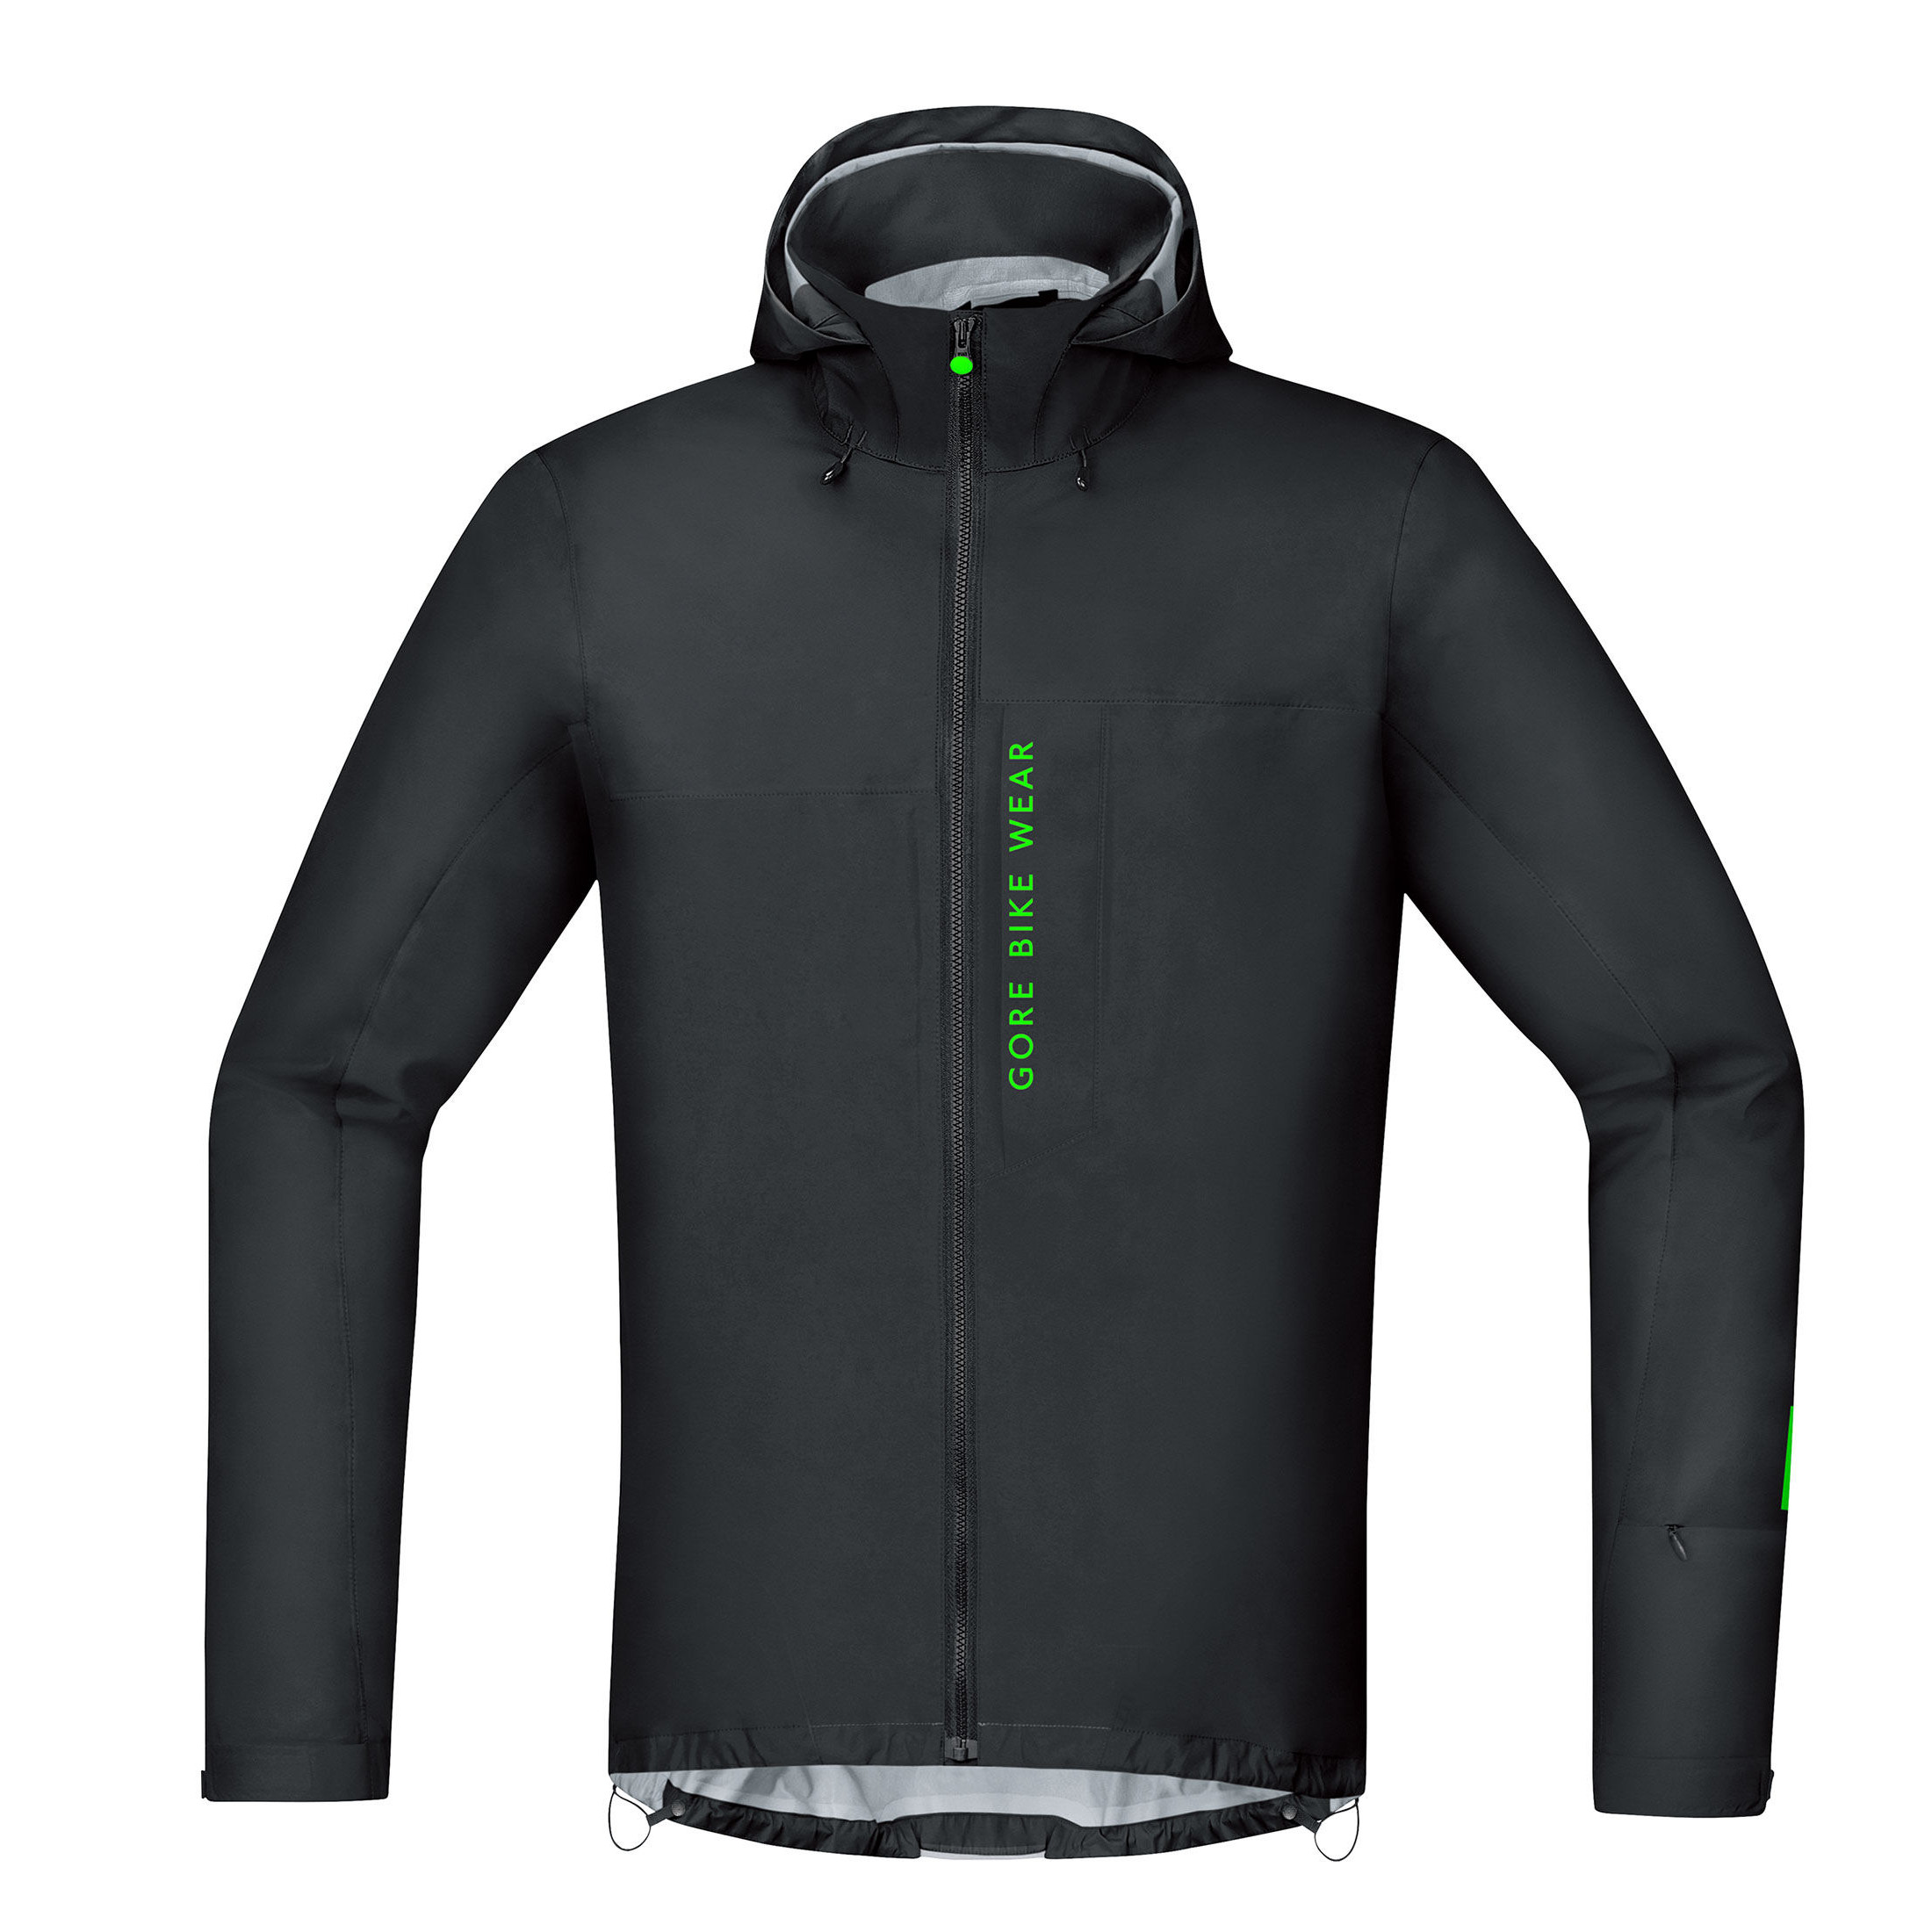 Gore Power Trail GT AS Jacket Black £199.99 fe50a289f